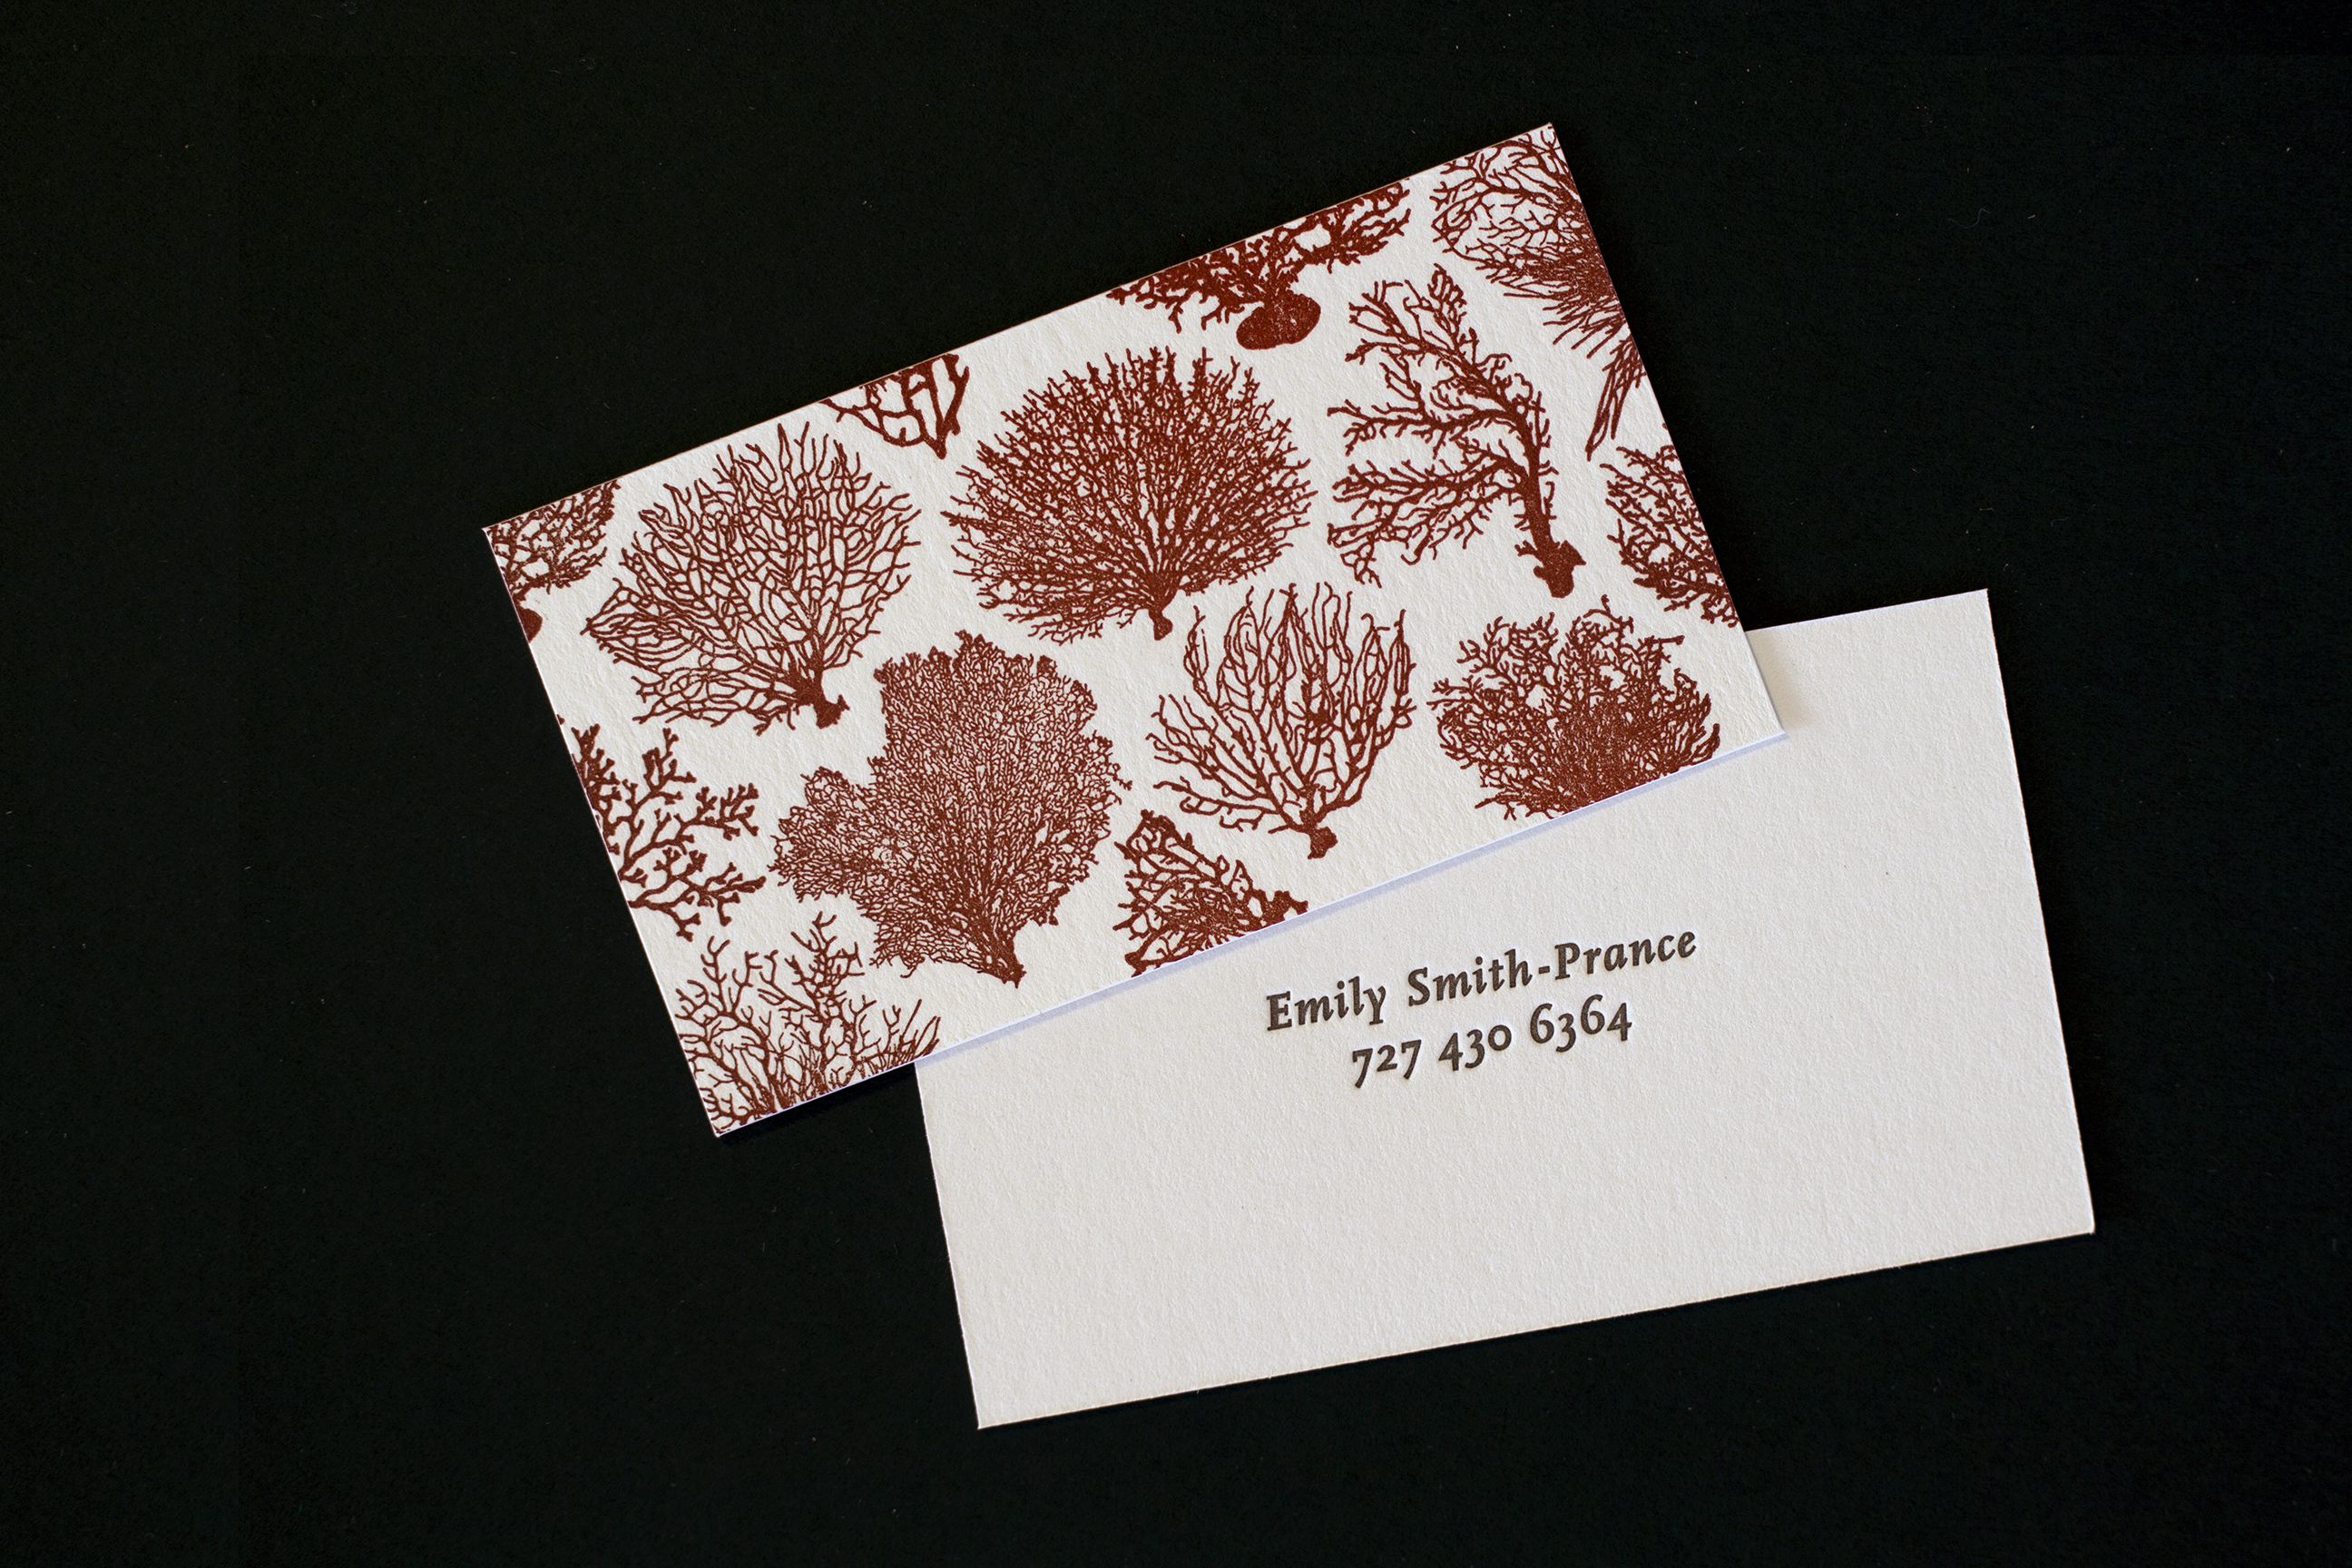 emily_smith-prance_1